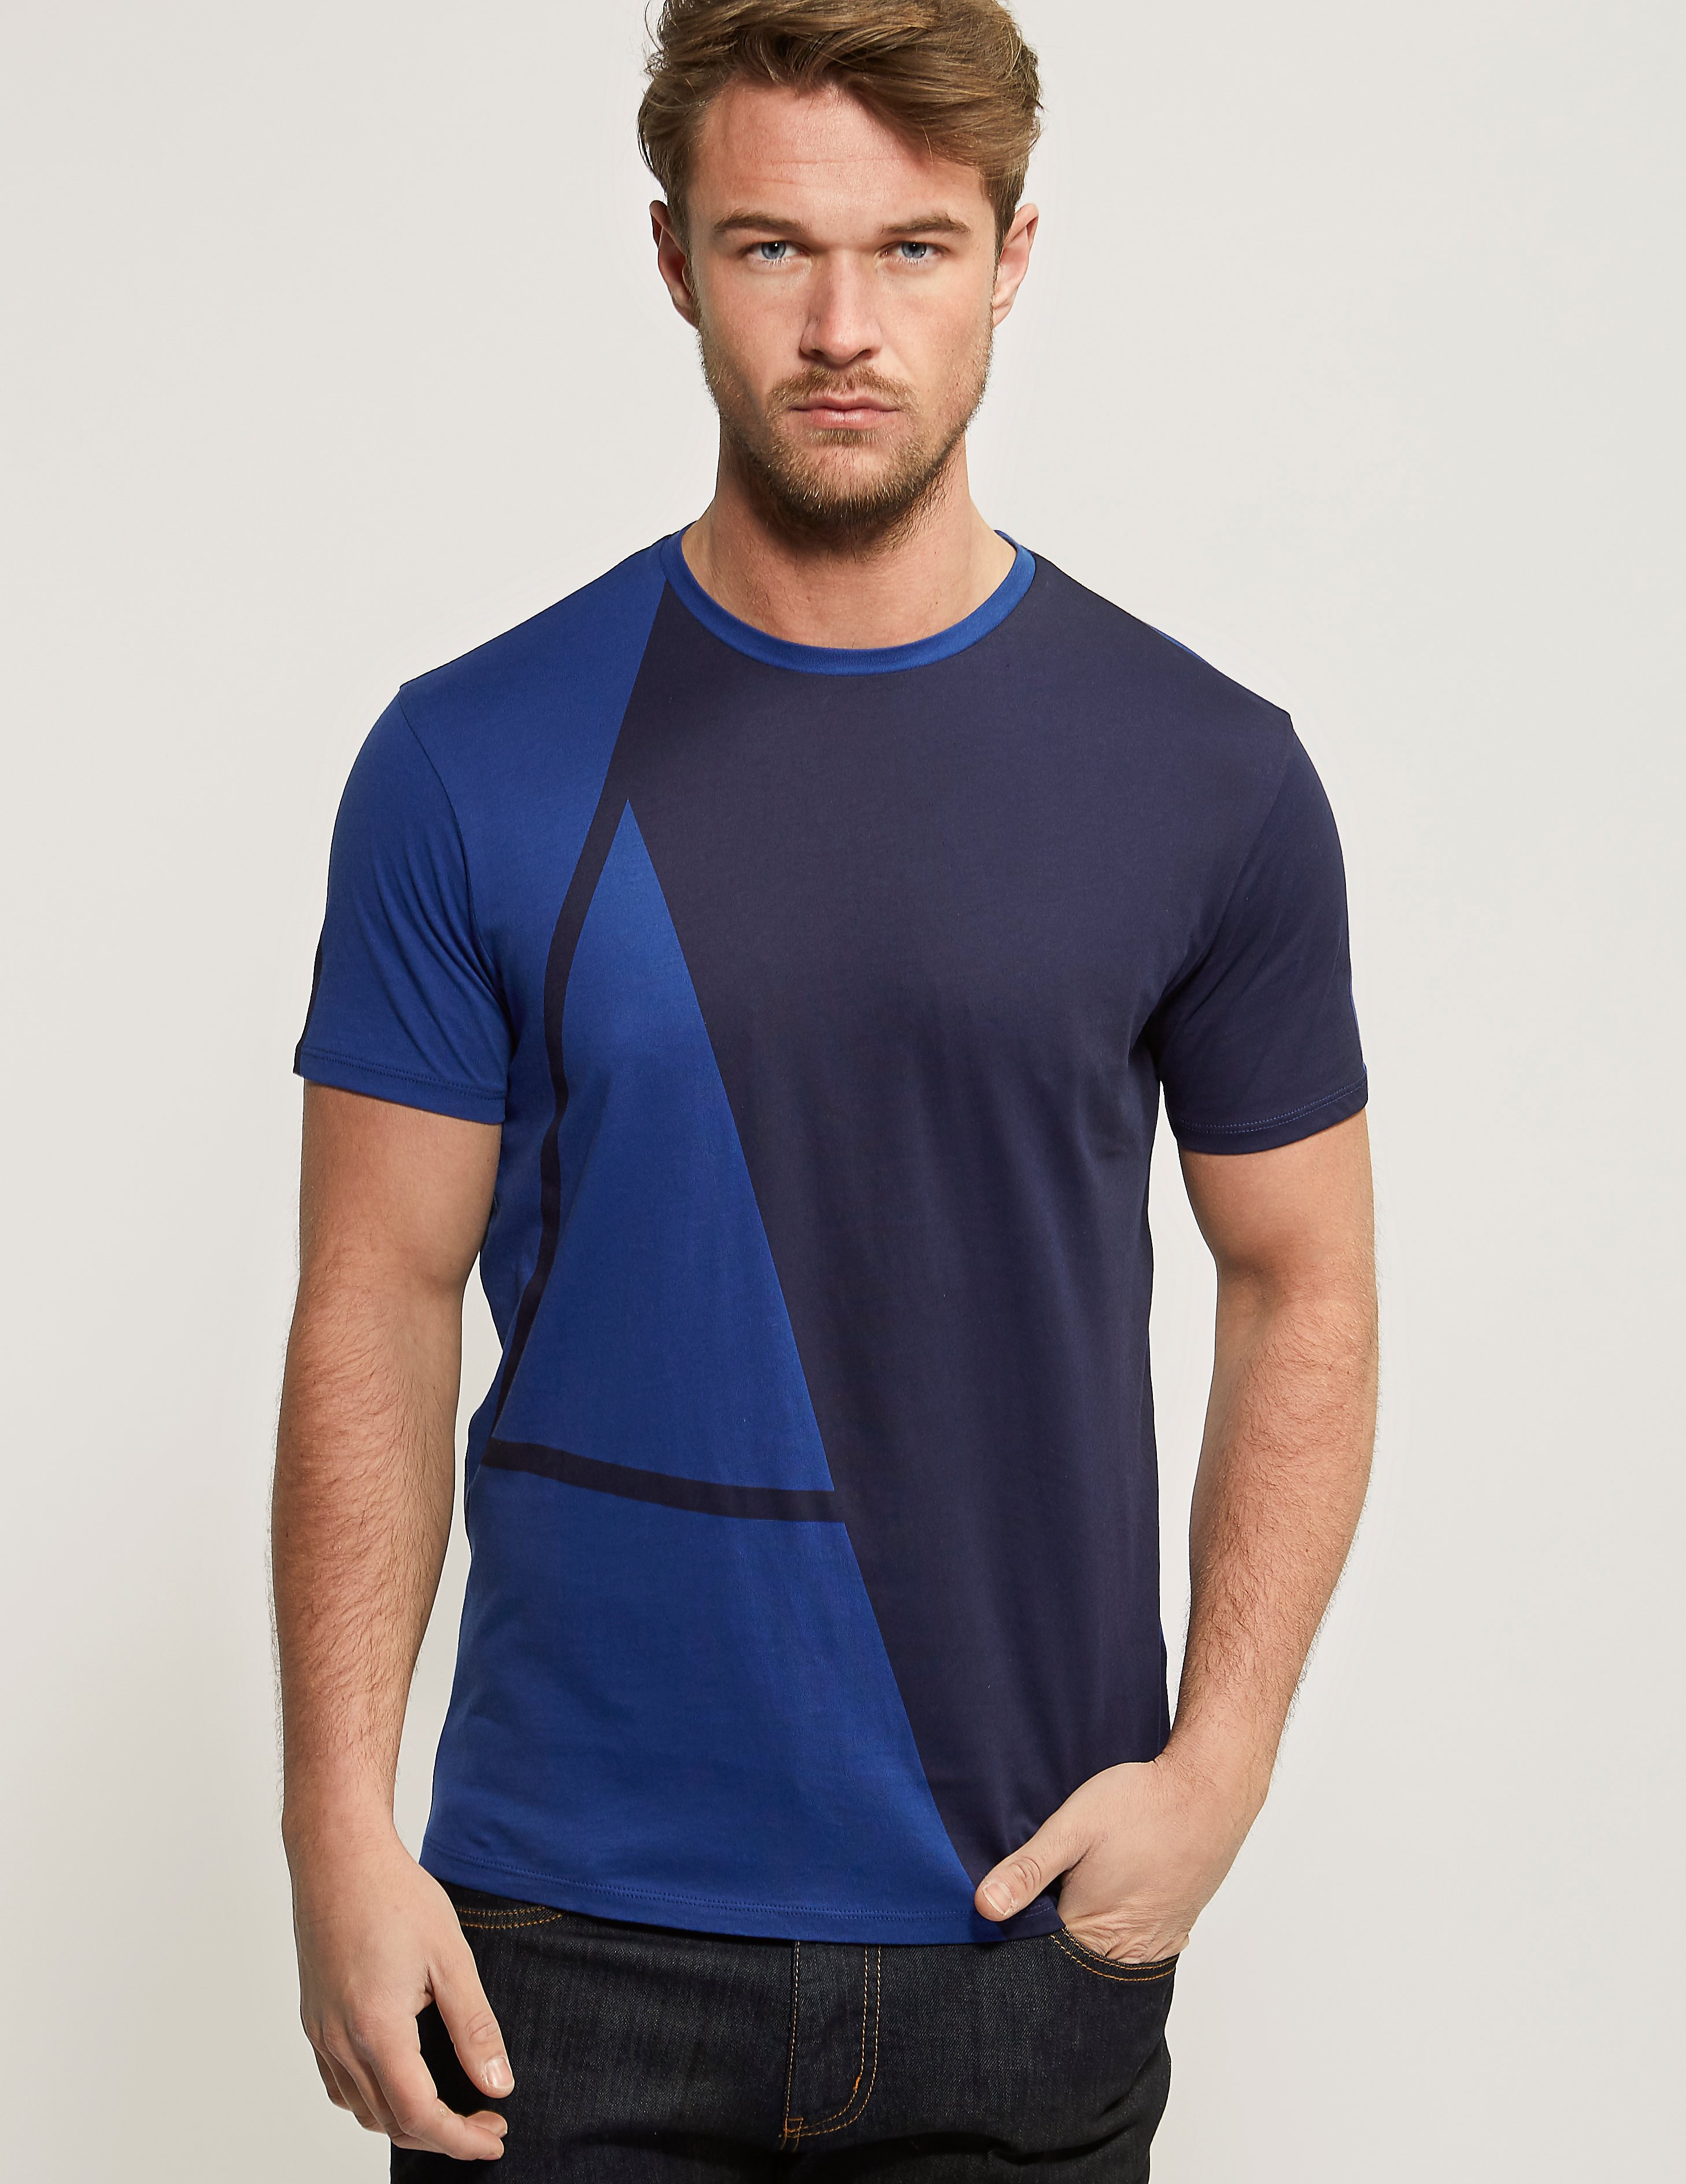 Armani Jeans Large AJ Short Sleeve T-Shirt